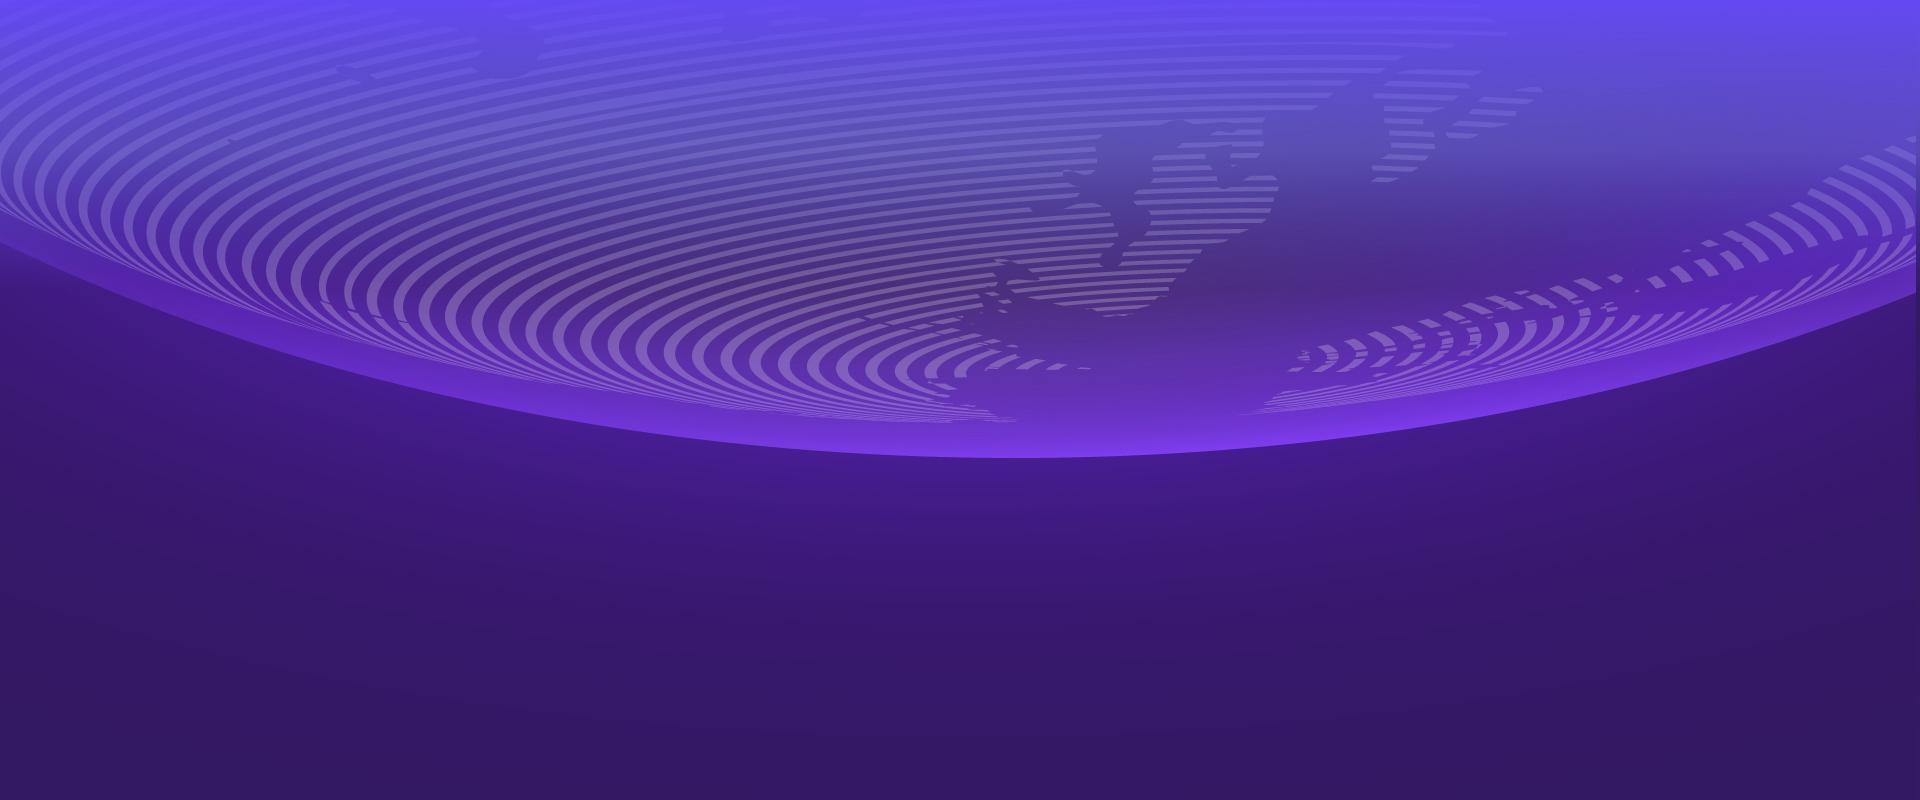 A digital representation of earth, bottom half